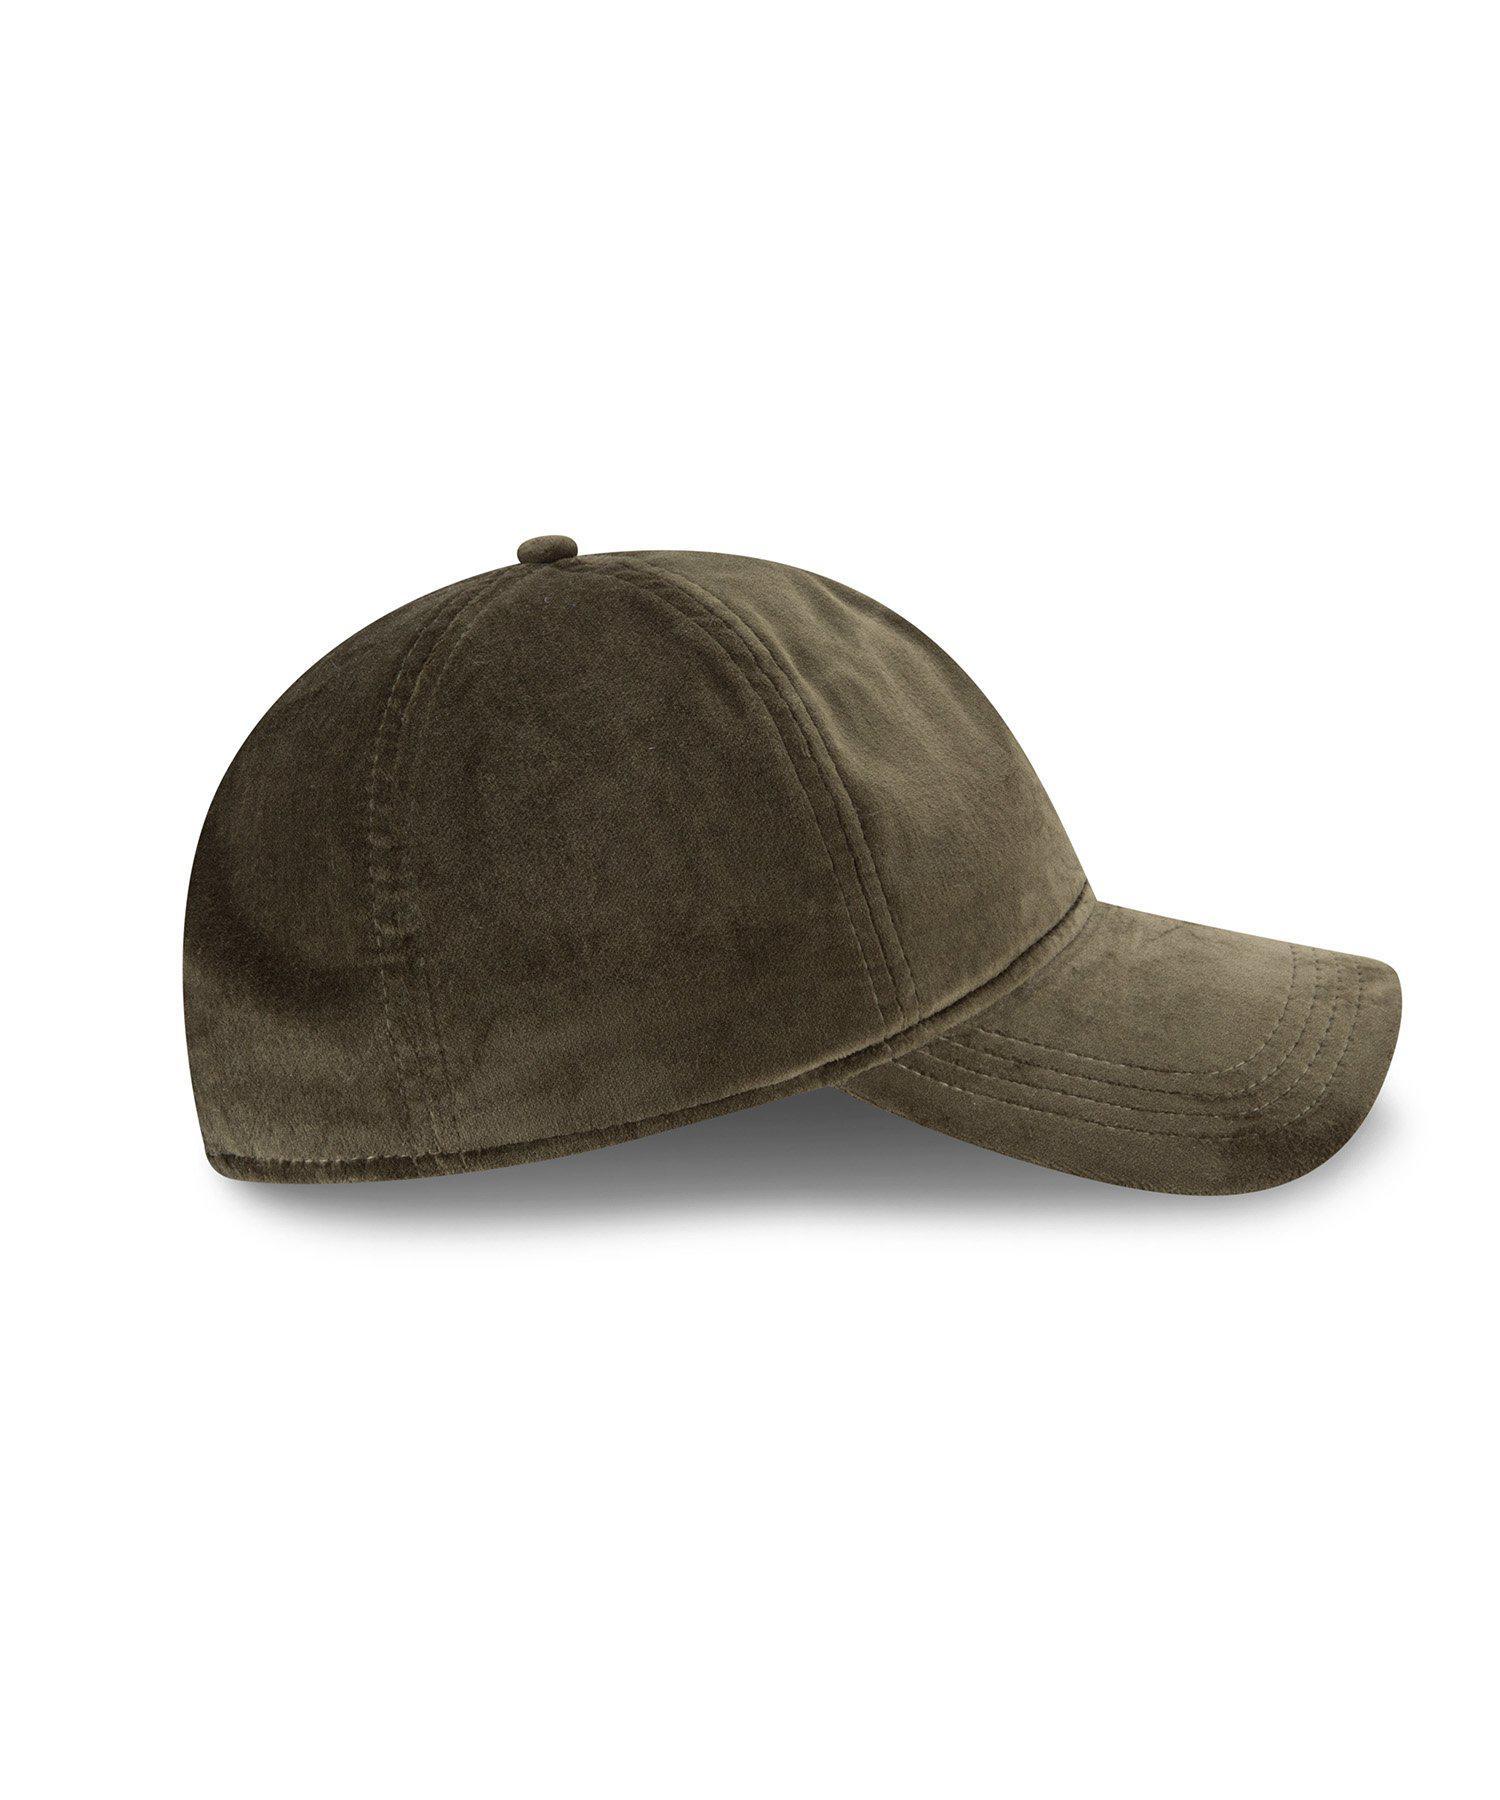 47bbada7df1 Lyst - NEW ERA HATS New Era Velvet 9twenty Cap In Olive in Green for Men